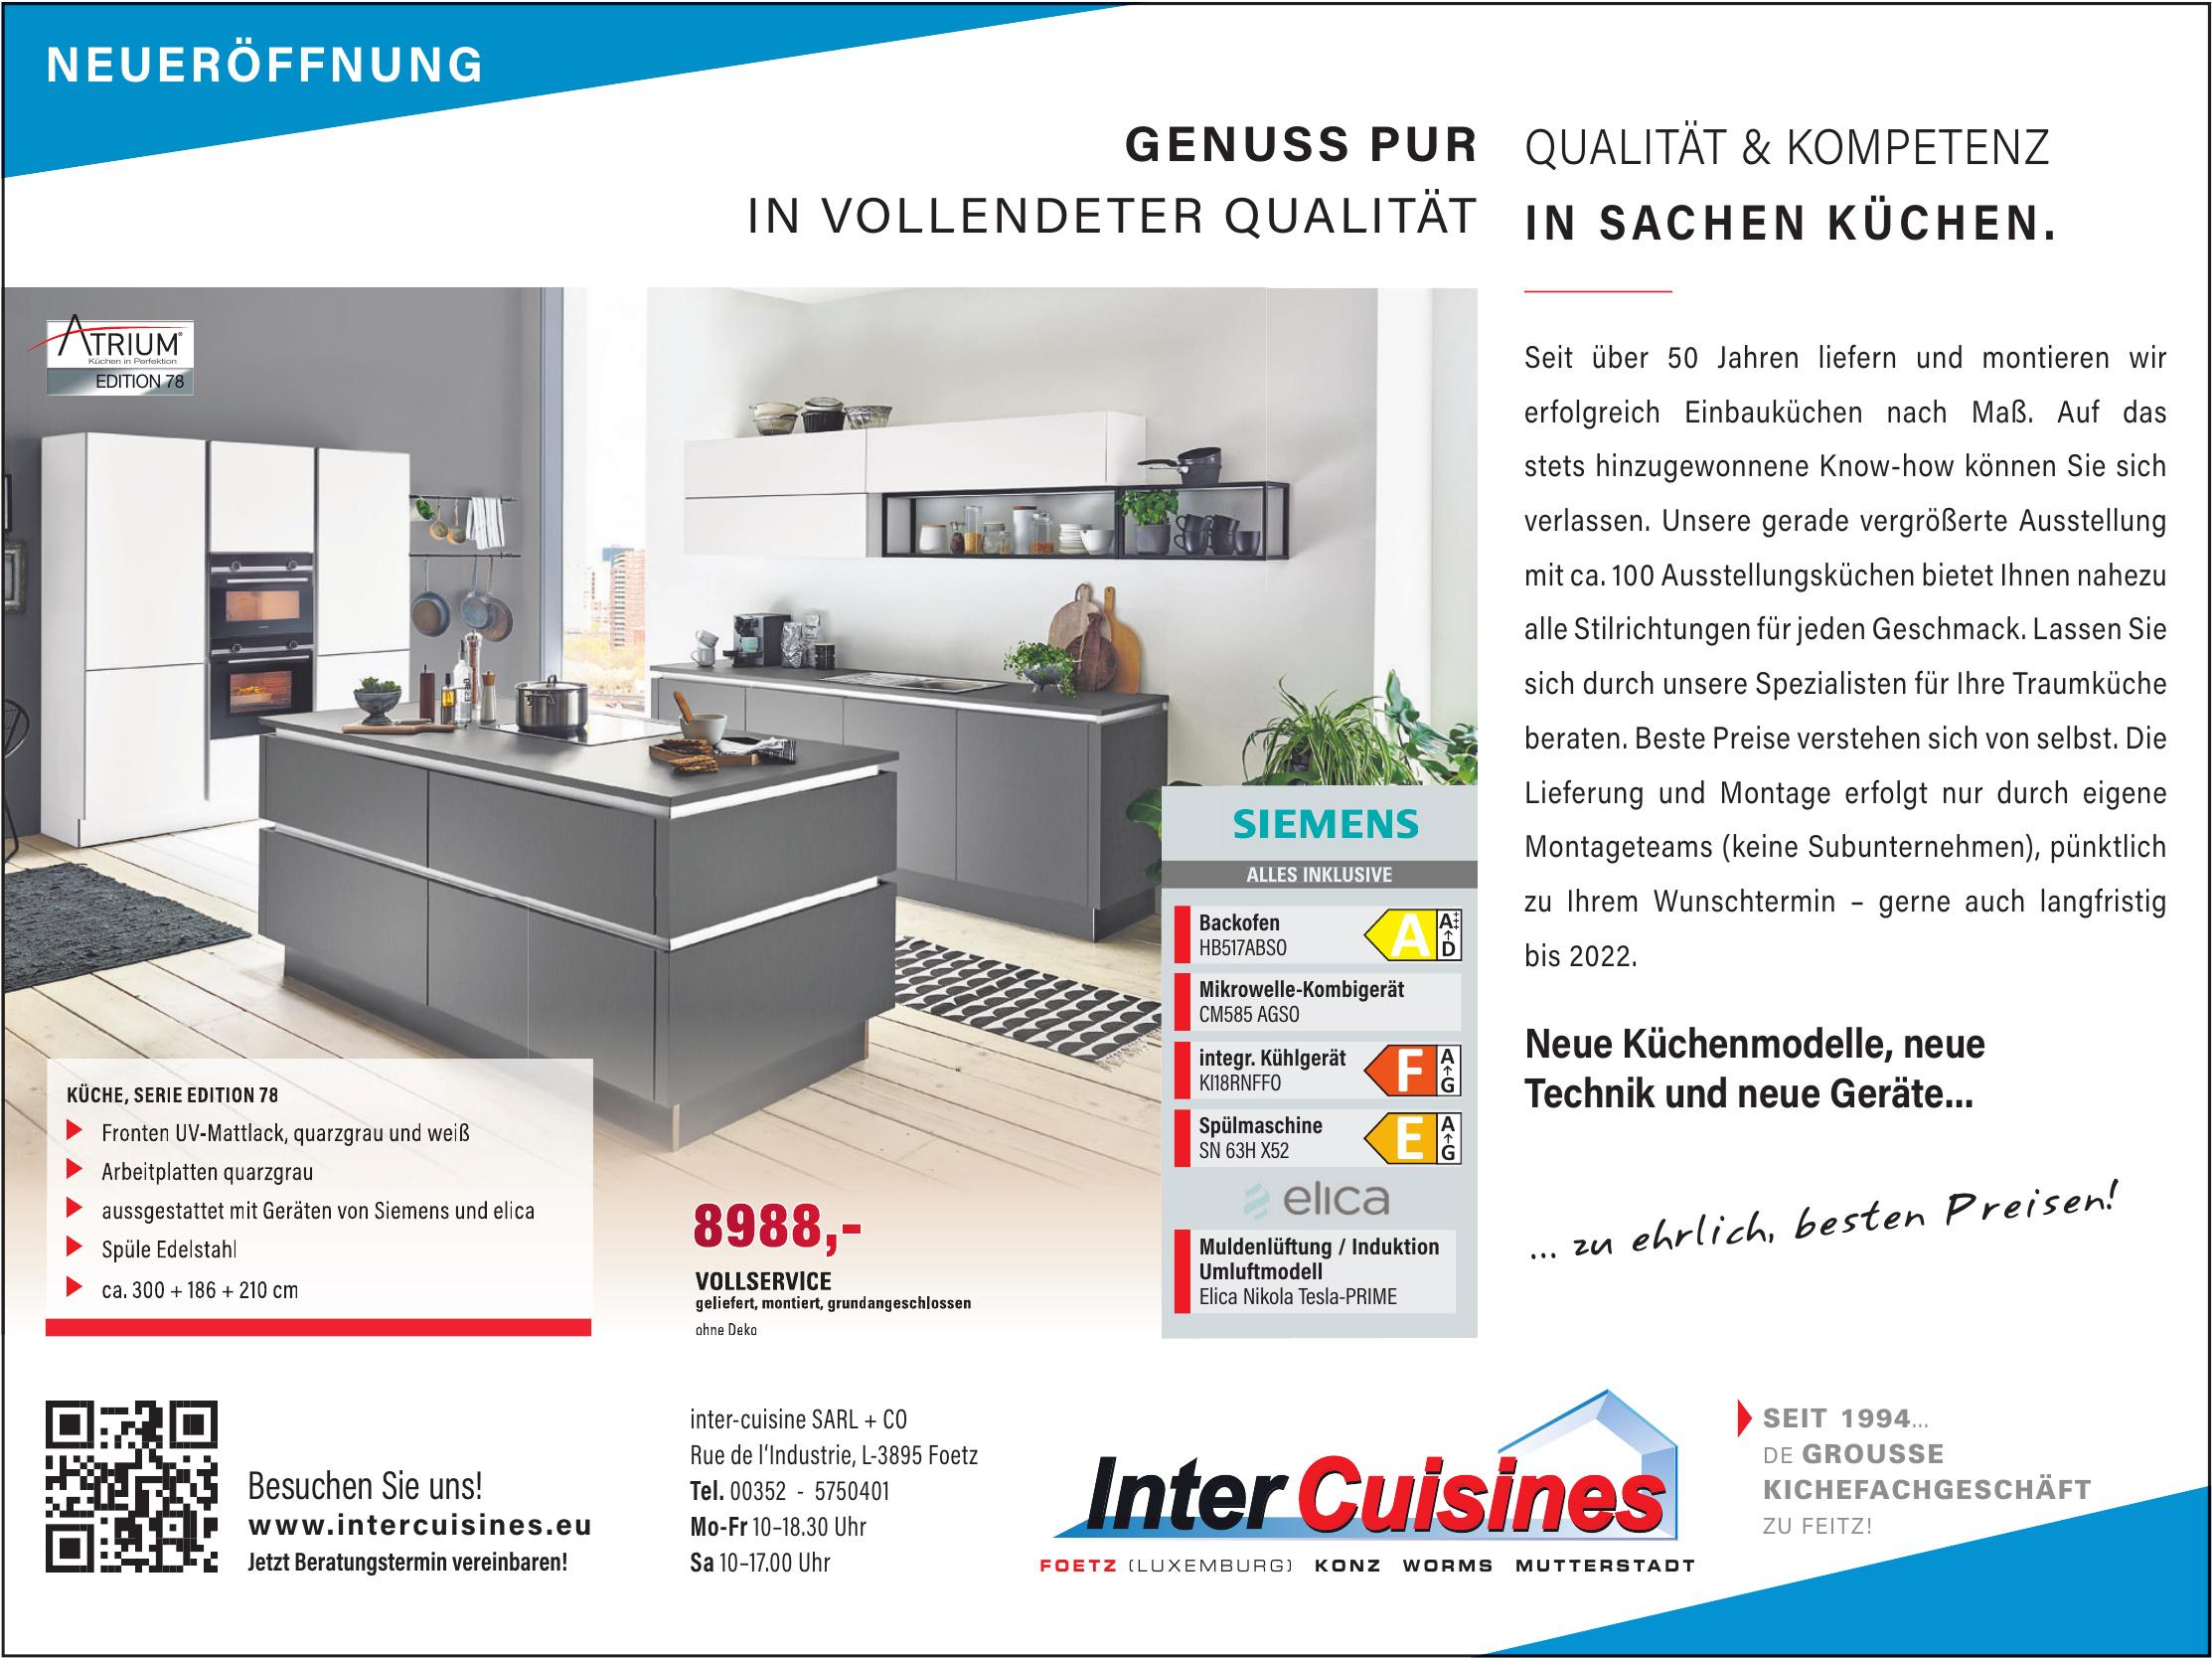 inter-cuisine SARL+CO